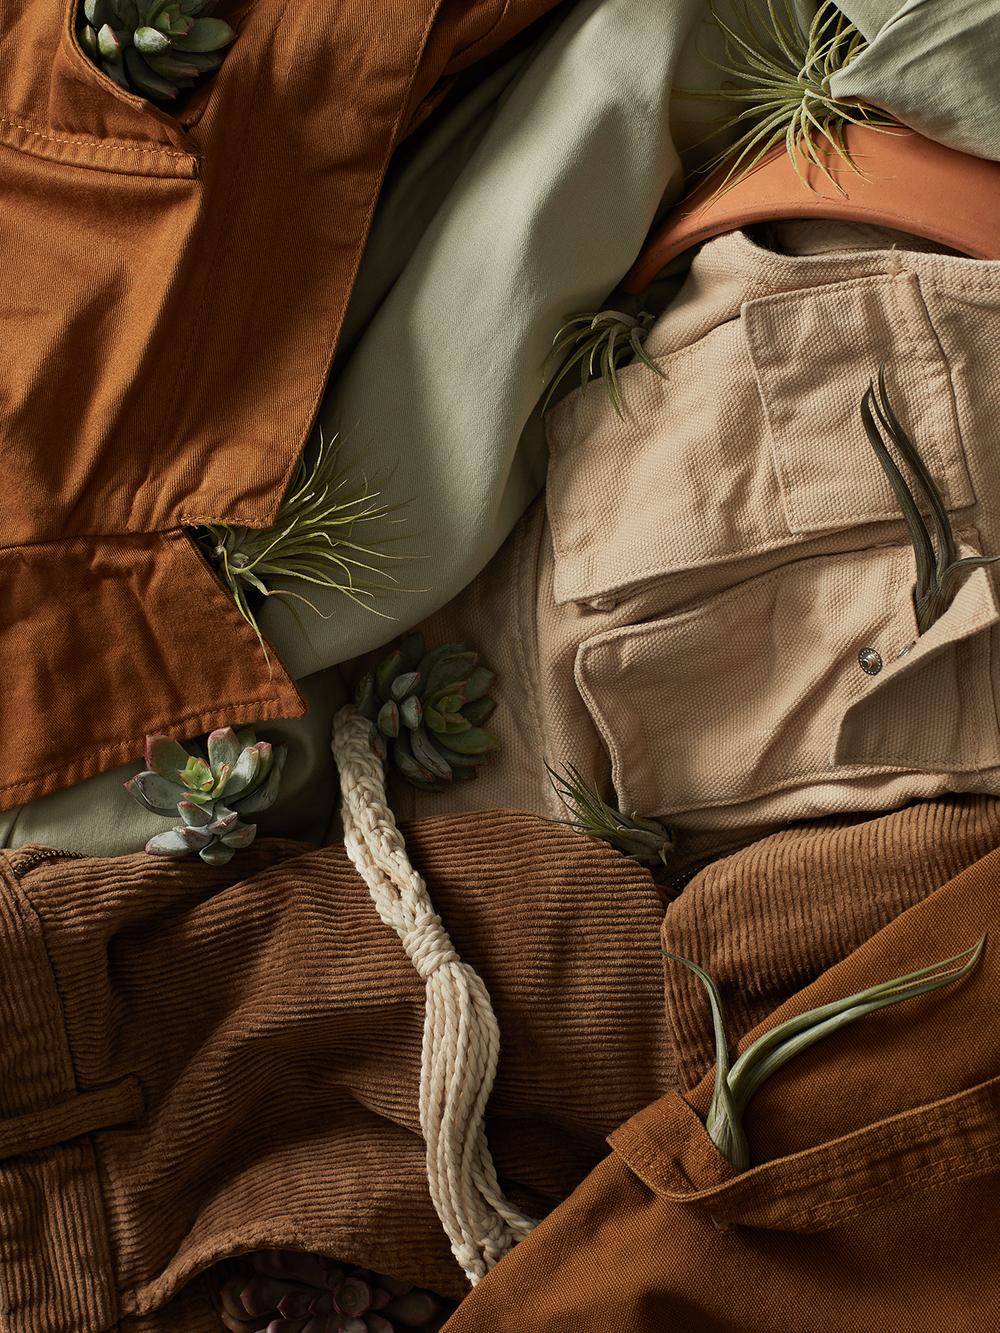 Khaki and cords mens wardrobe photo stylist